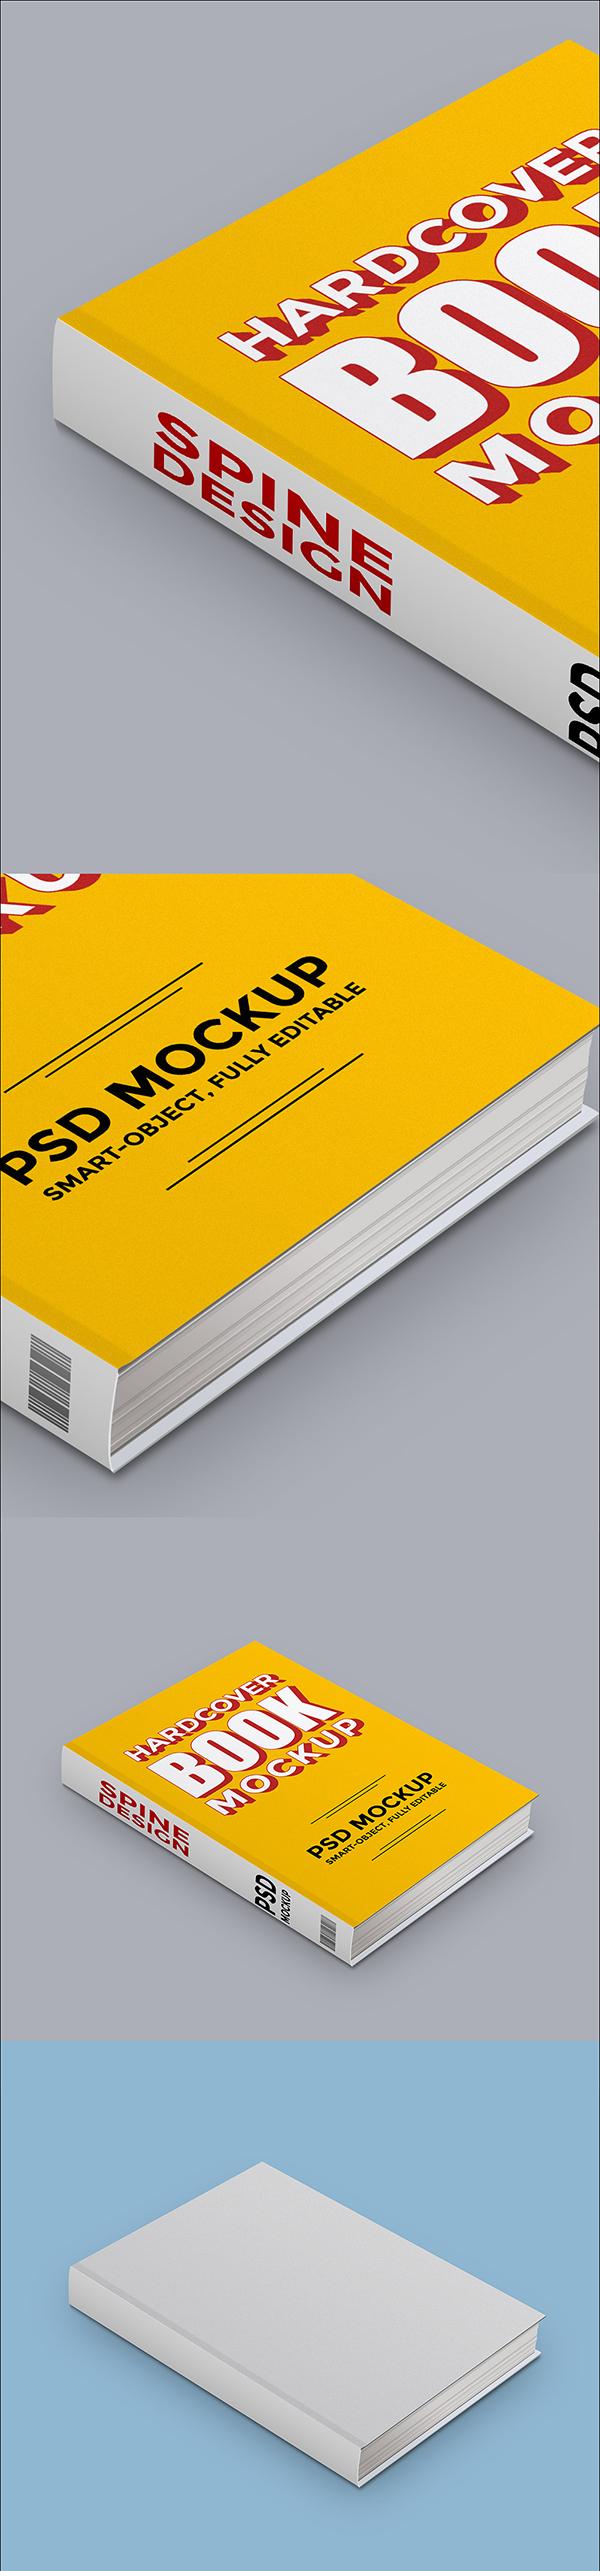 05 Hardcover Book PSD Mockup